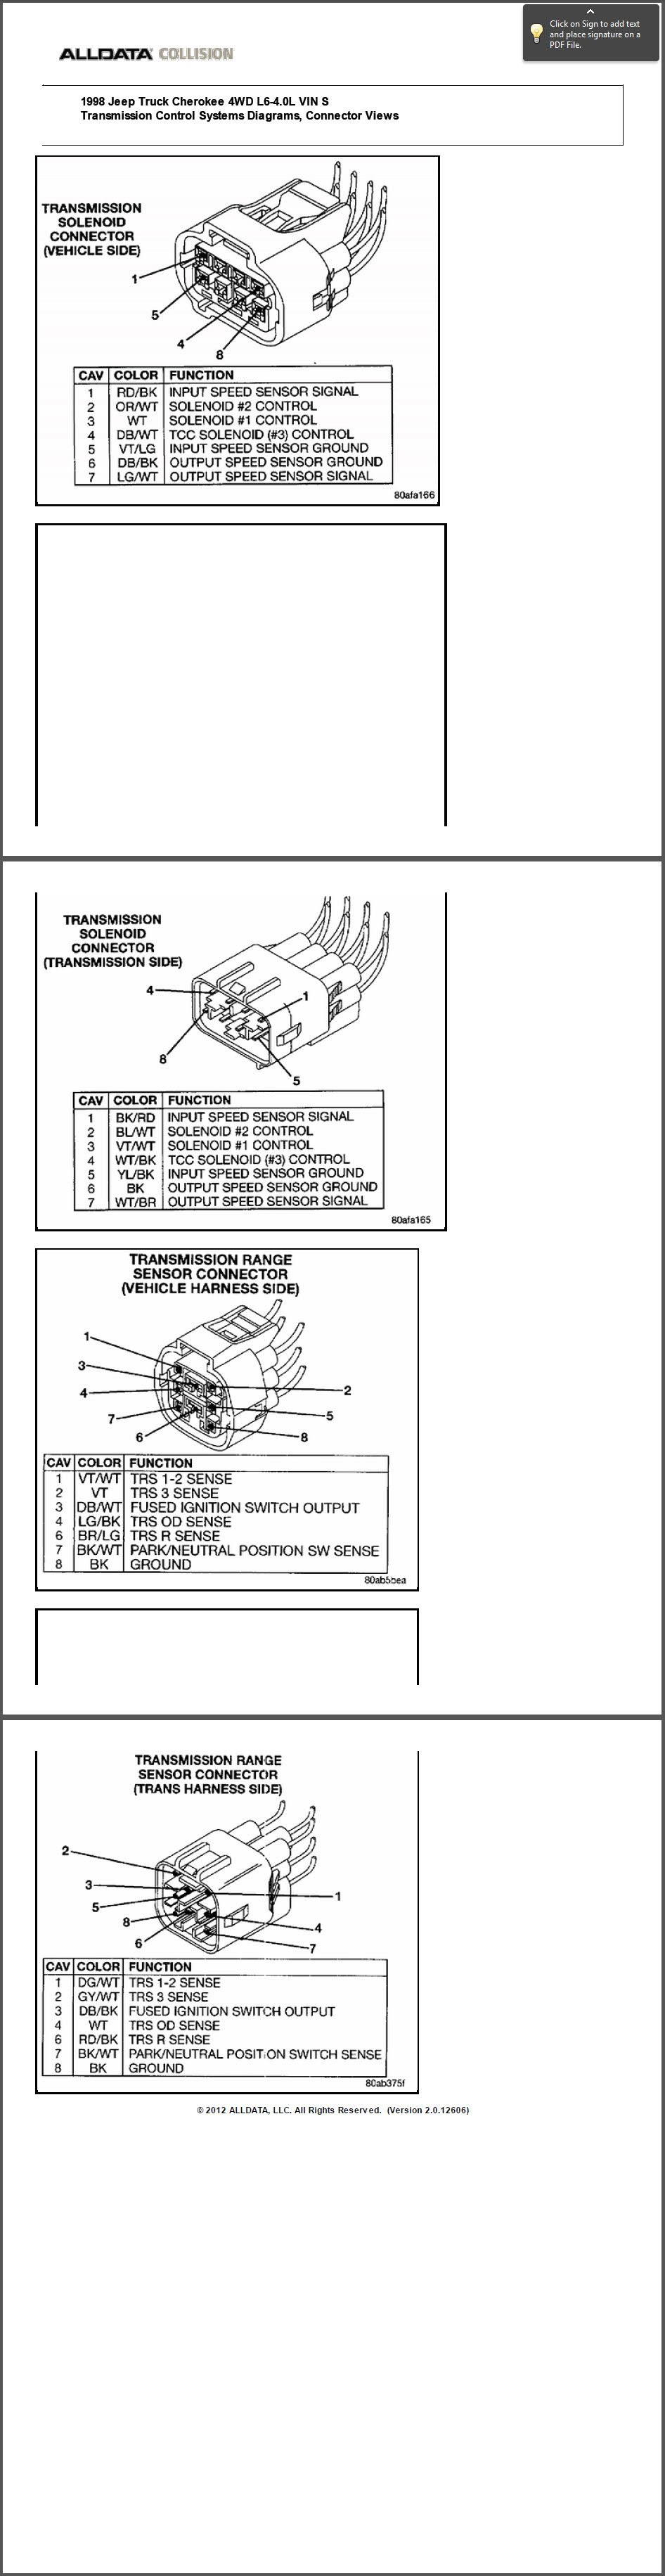 2003 Jeep Cherokee 4.7 Hydraulic Fan Wiring Diagram Wj P0740 Jeep Cherokee forum Of 2003 Jeep Cherokee 4.7 Hydraulic Fan Wiring Diagram